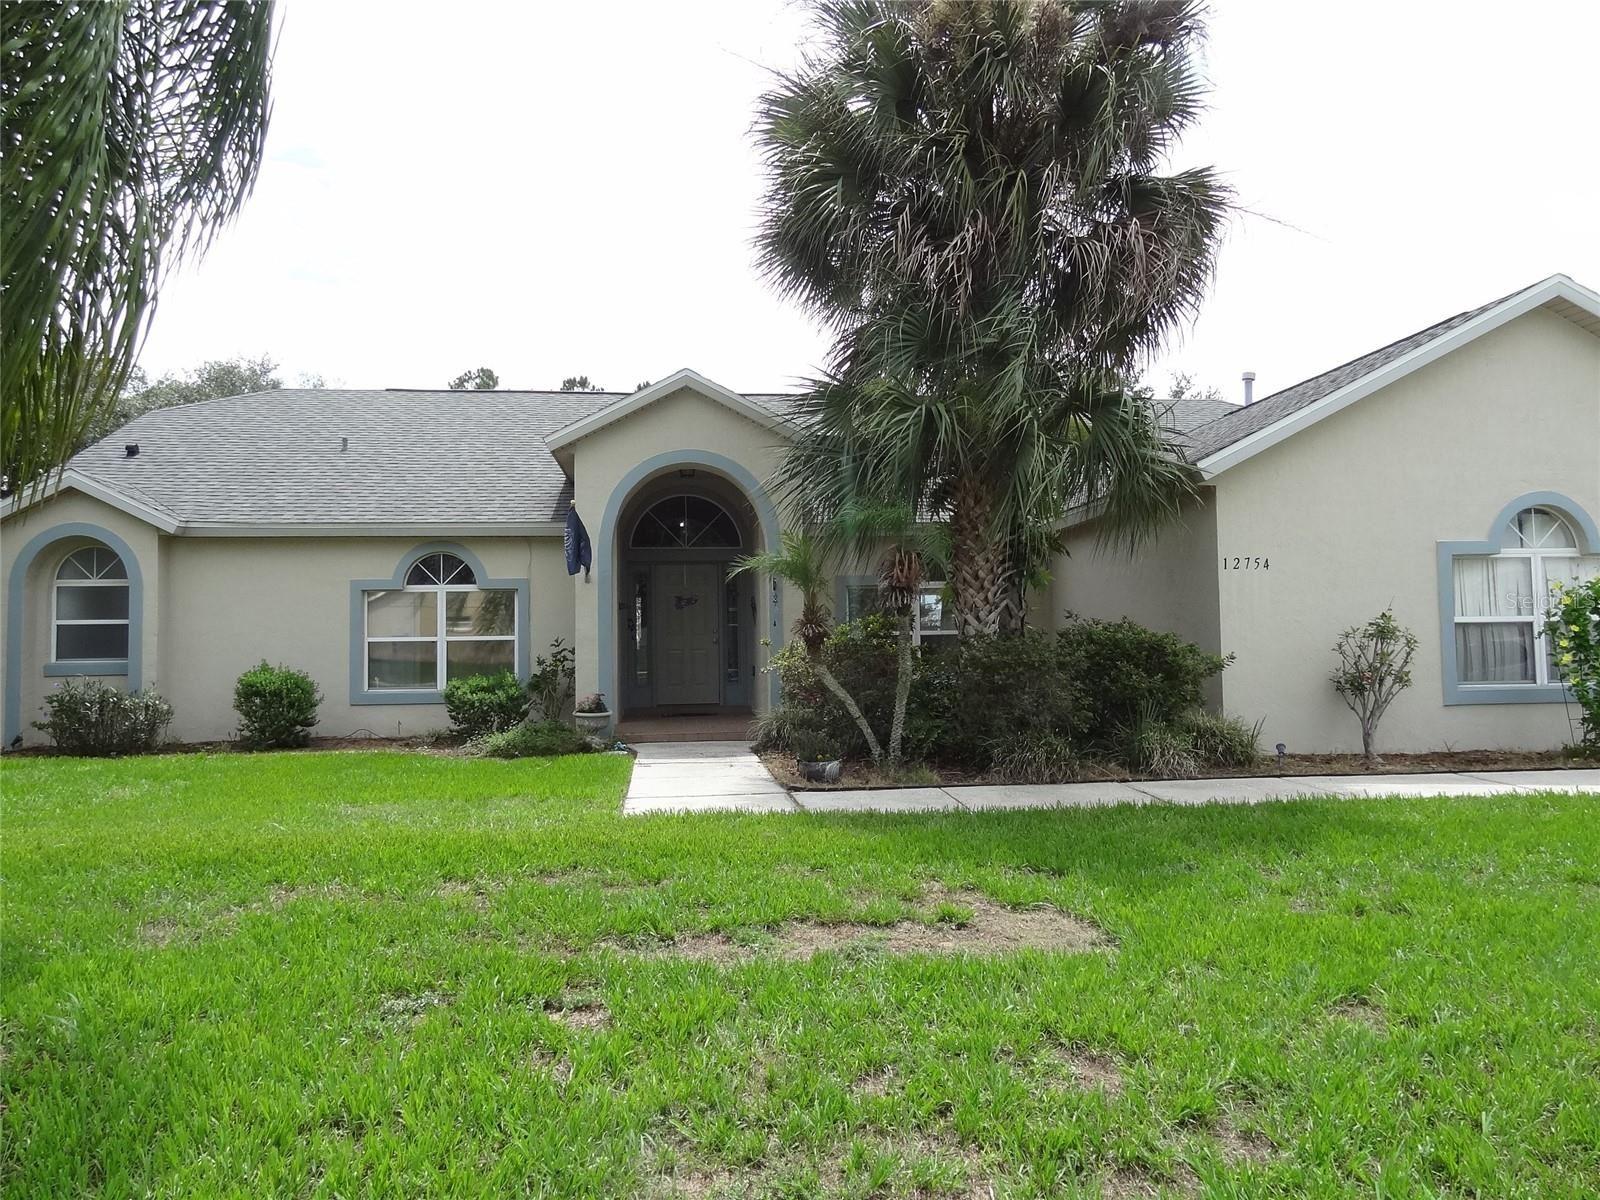 12754 SCOTTISH PINE LANE, Clermont, FL 34711 - #: G5043546